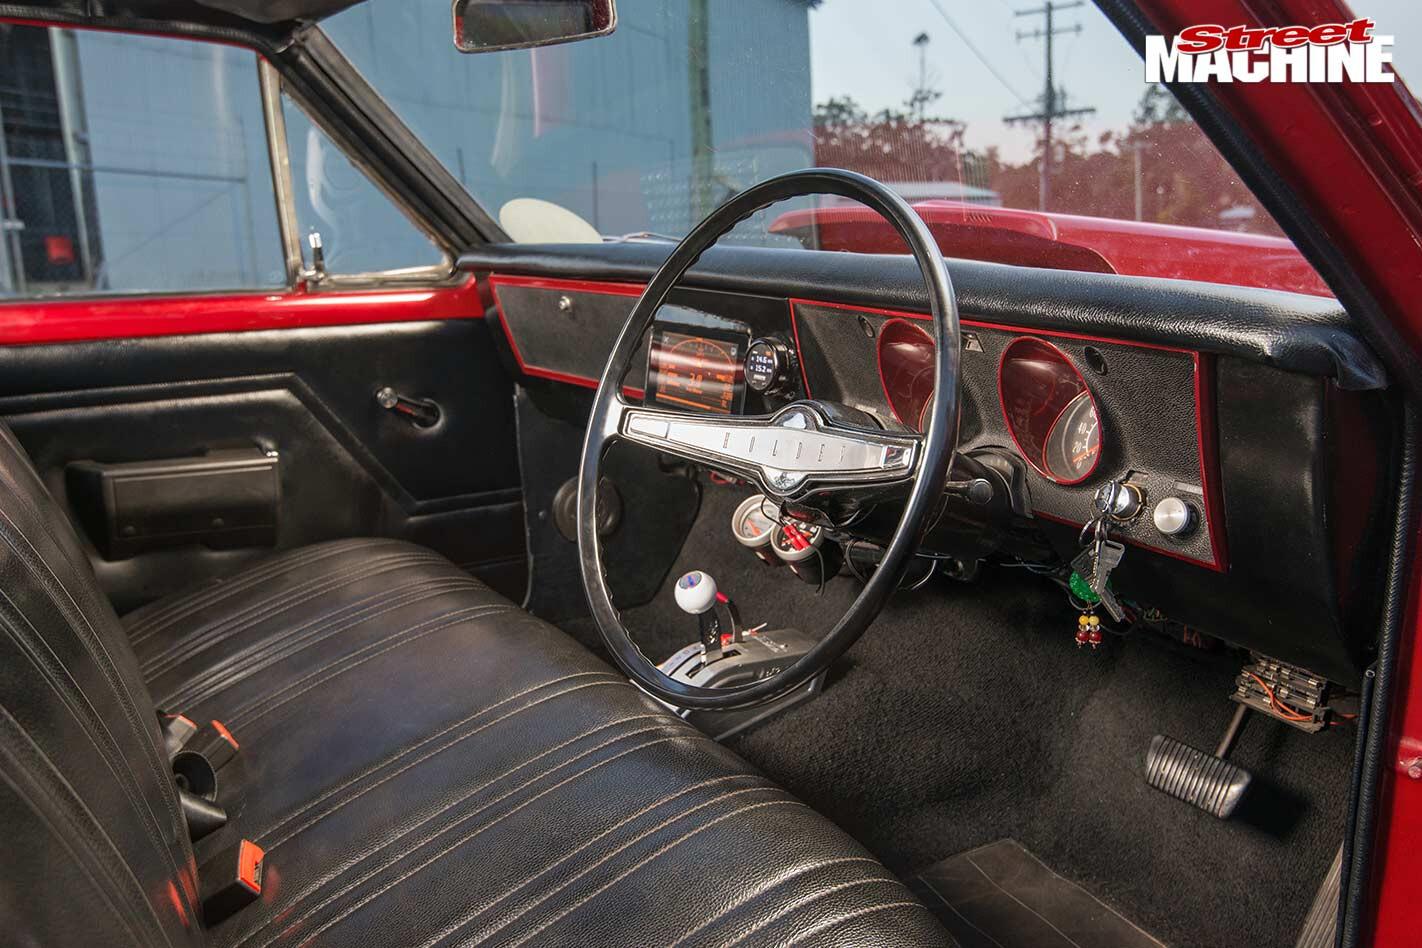 Holden HG wagon interior